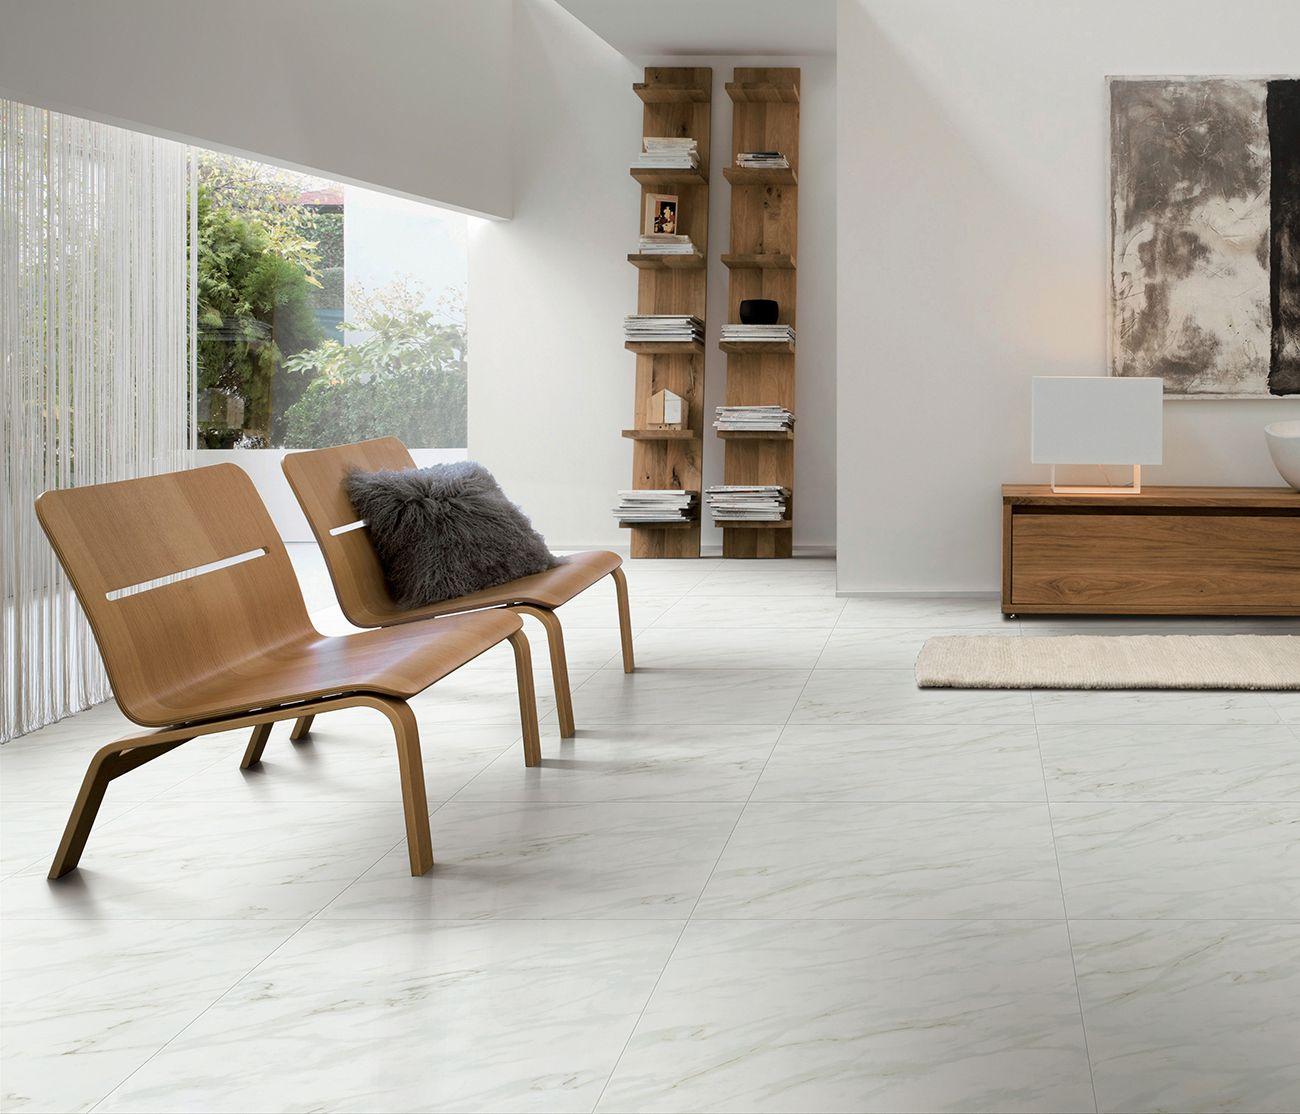 Matt Carrara White Flooring Bathroom Tile Designs White Floors Bedroom Decor Dark Most popular room ceramics